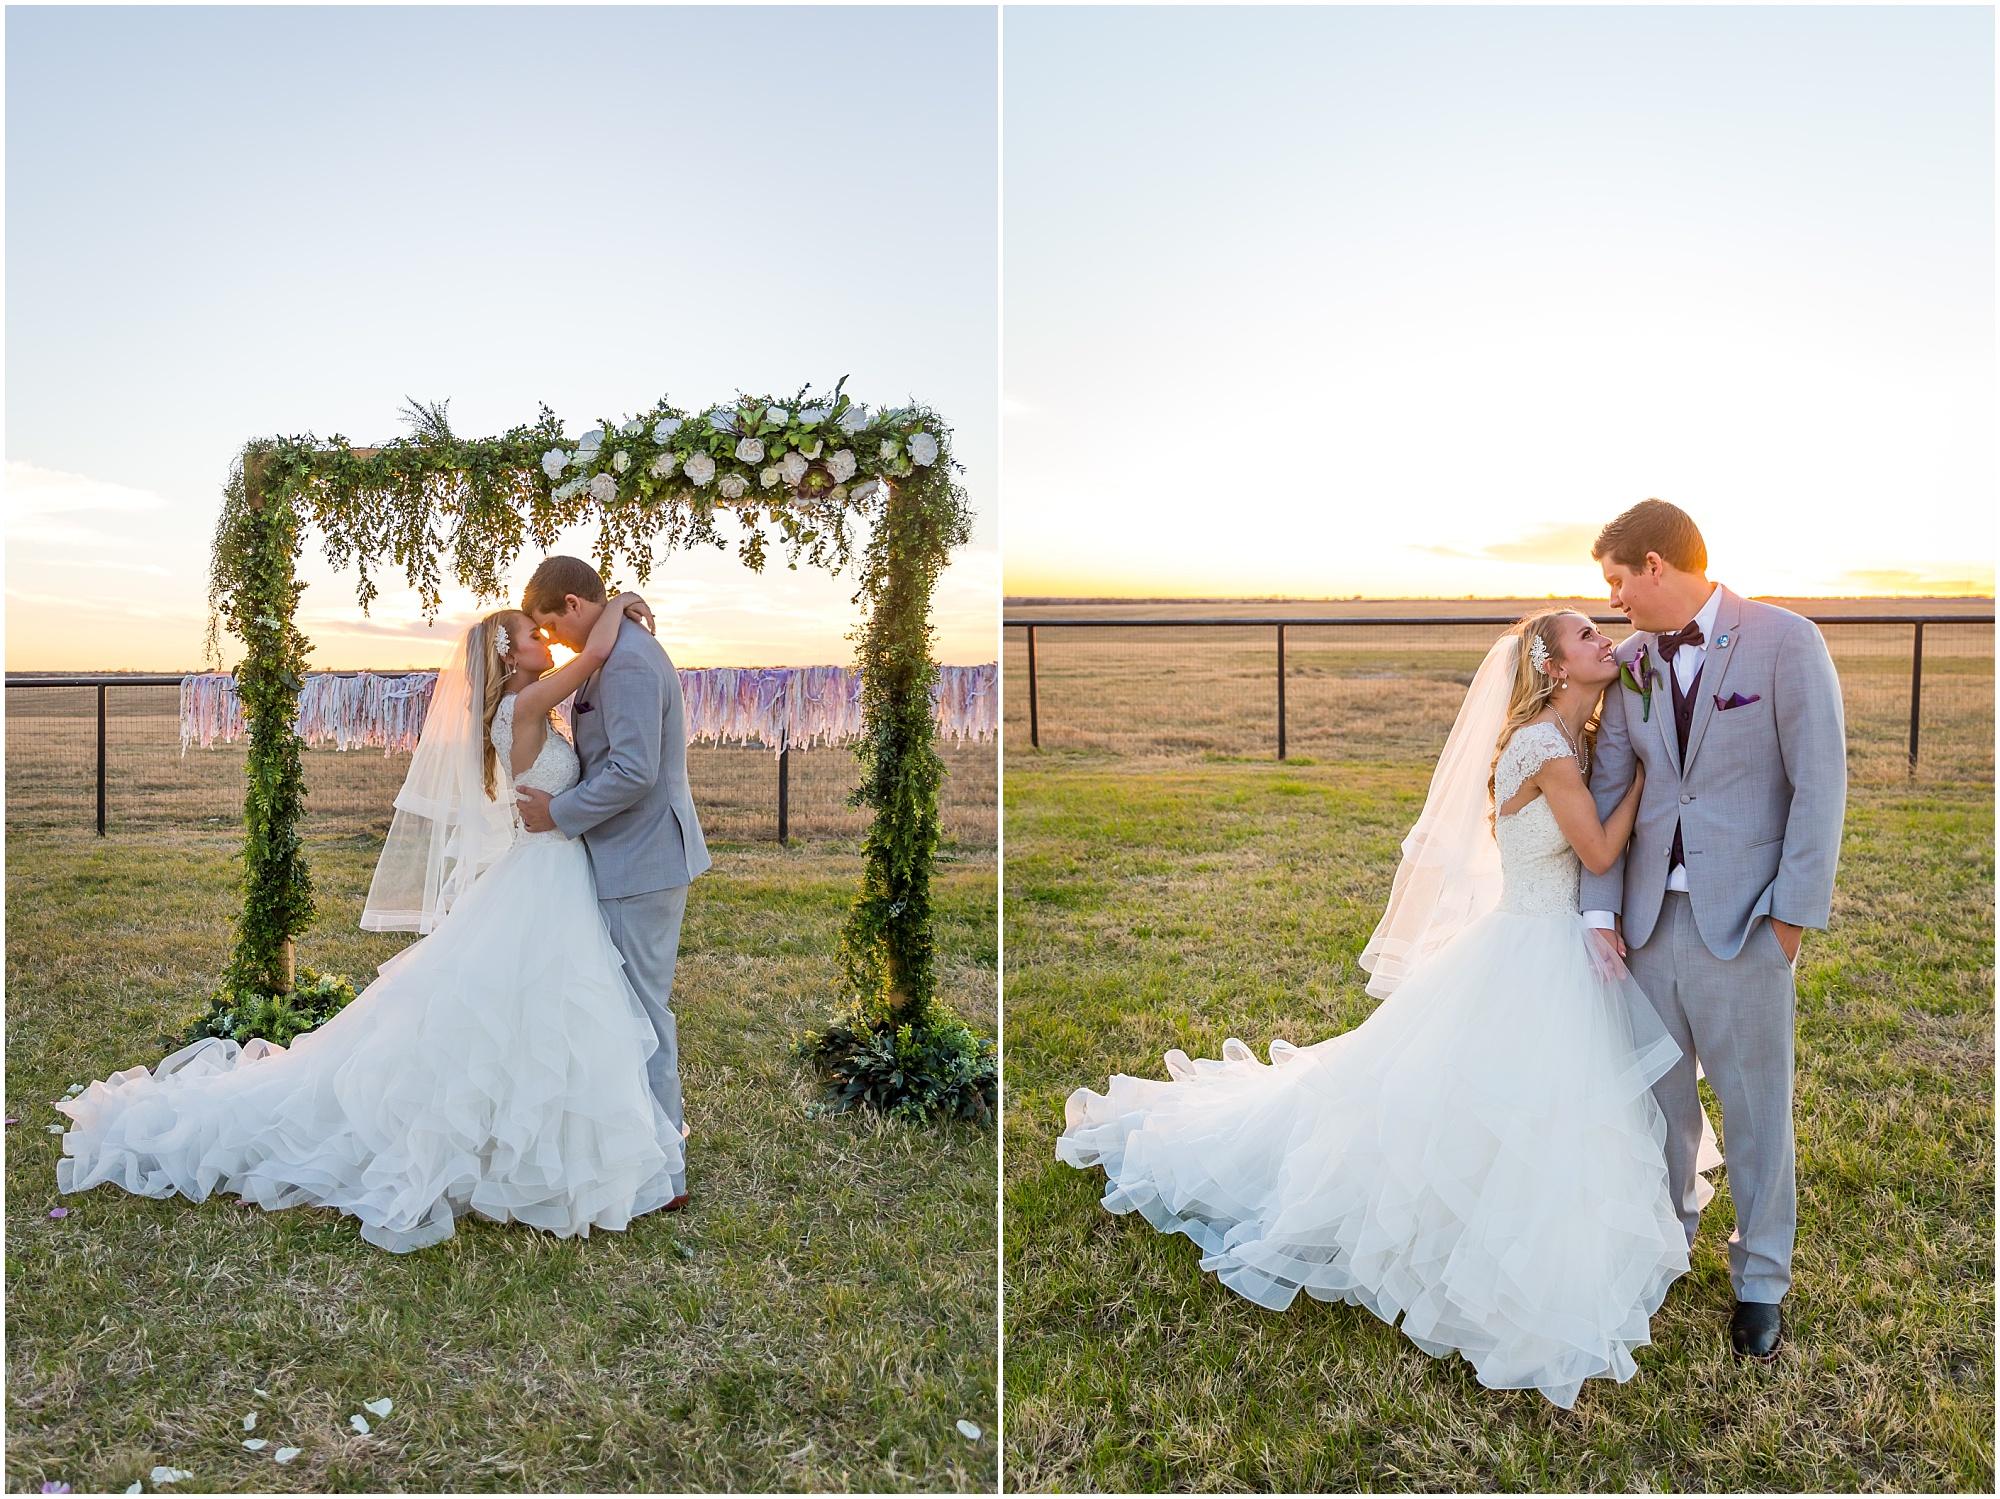 Disney-Inspired-Wedding-Central-Texas_0050.jpg